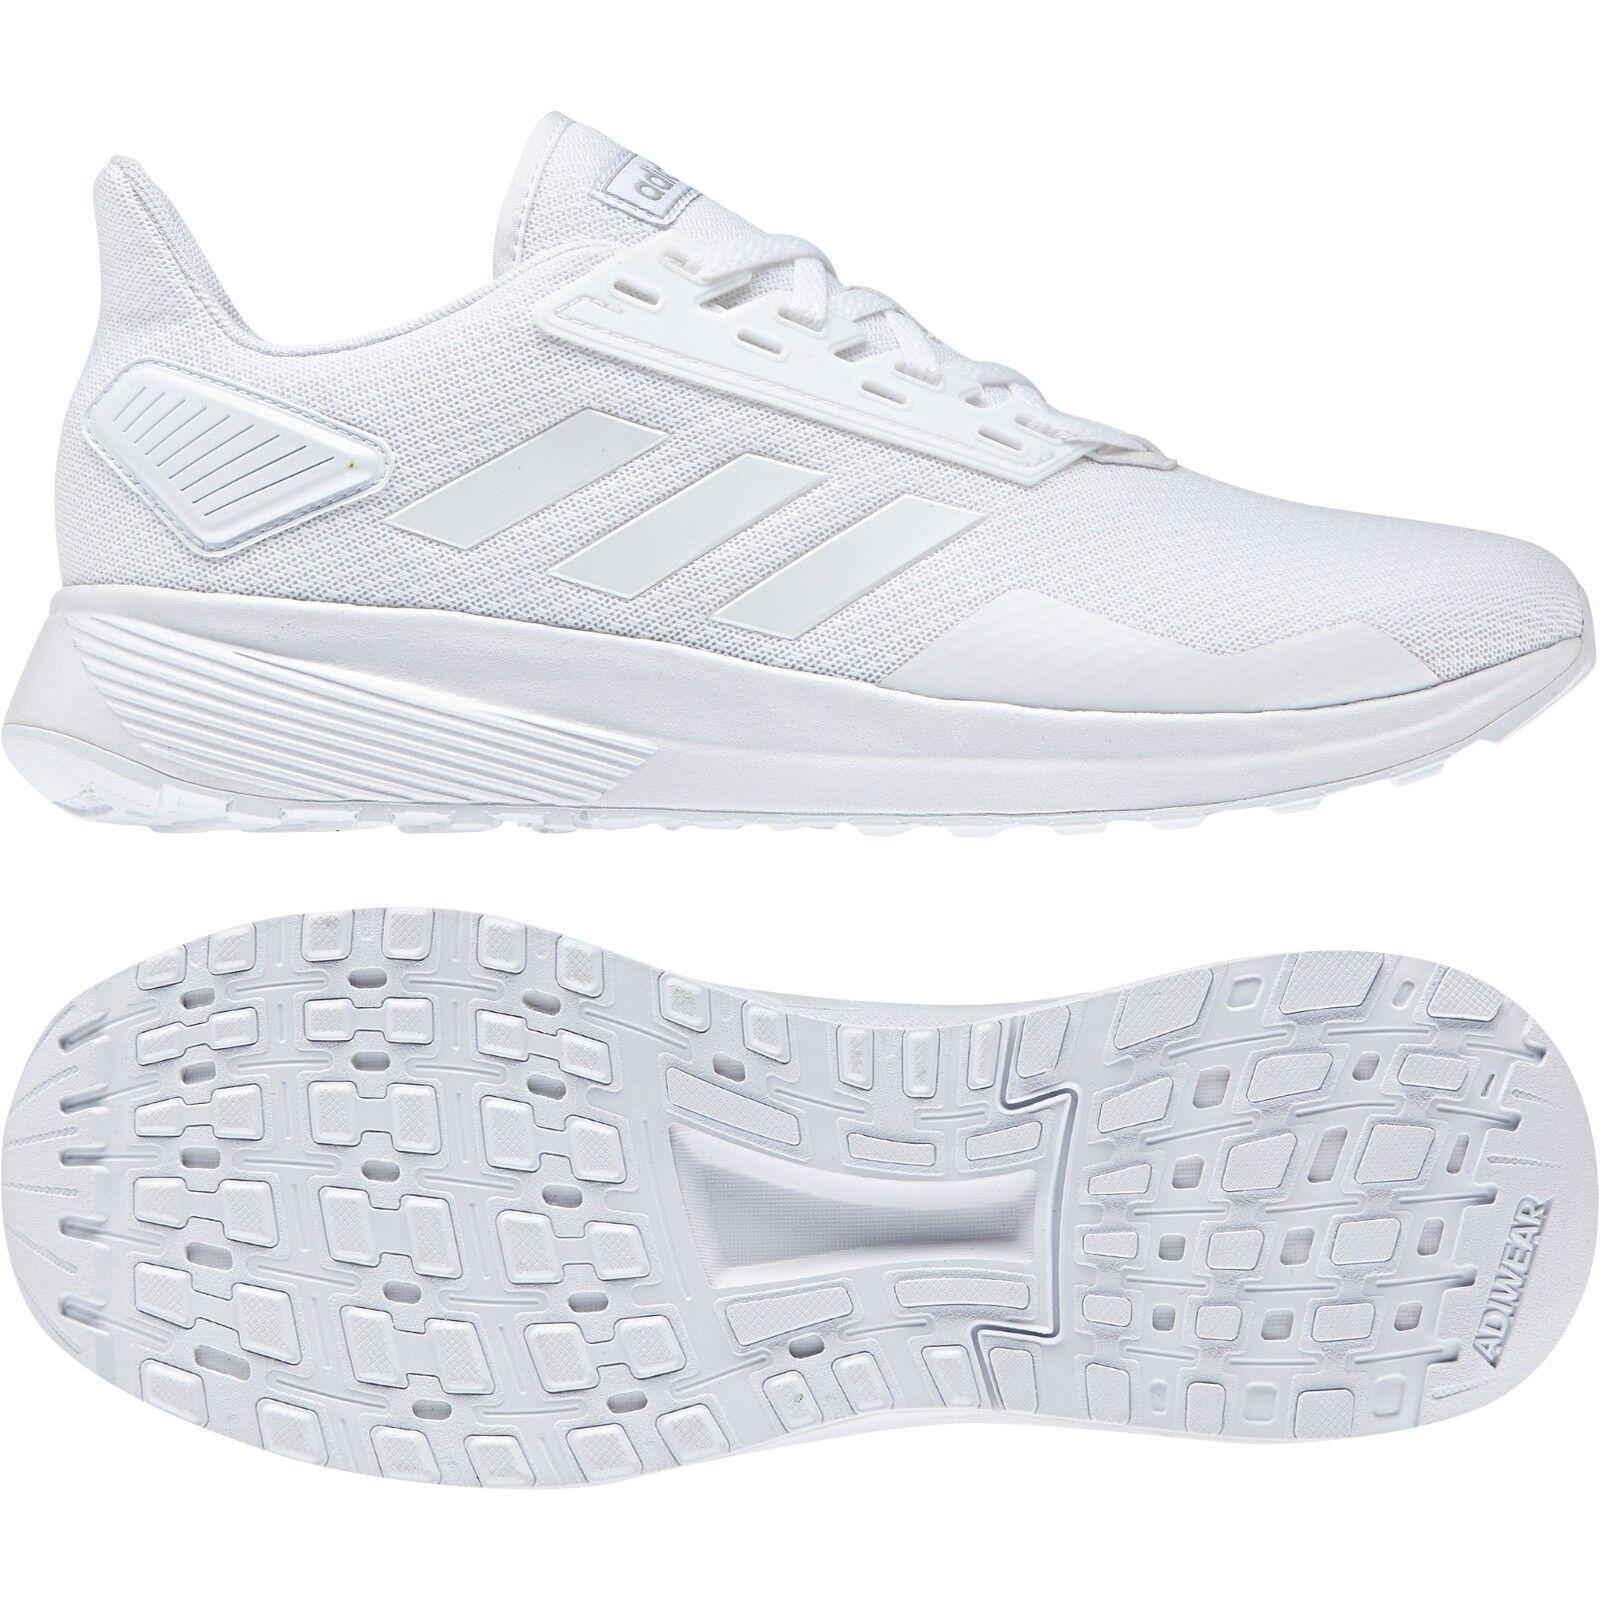 Adidas 9 Herren Schuhe Essential Duramo 9 Adidas trainieren Mode Fitness Turnschuhe aa43e9